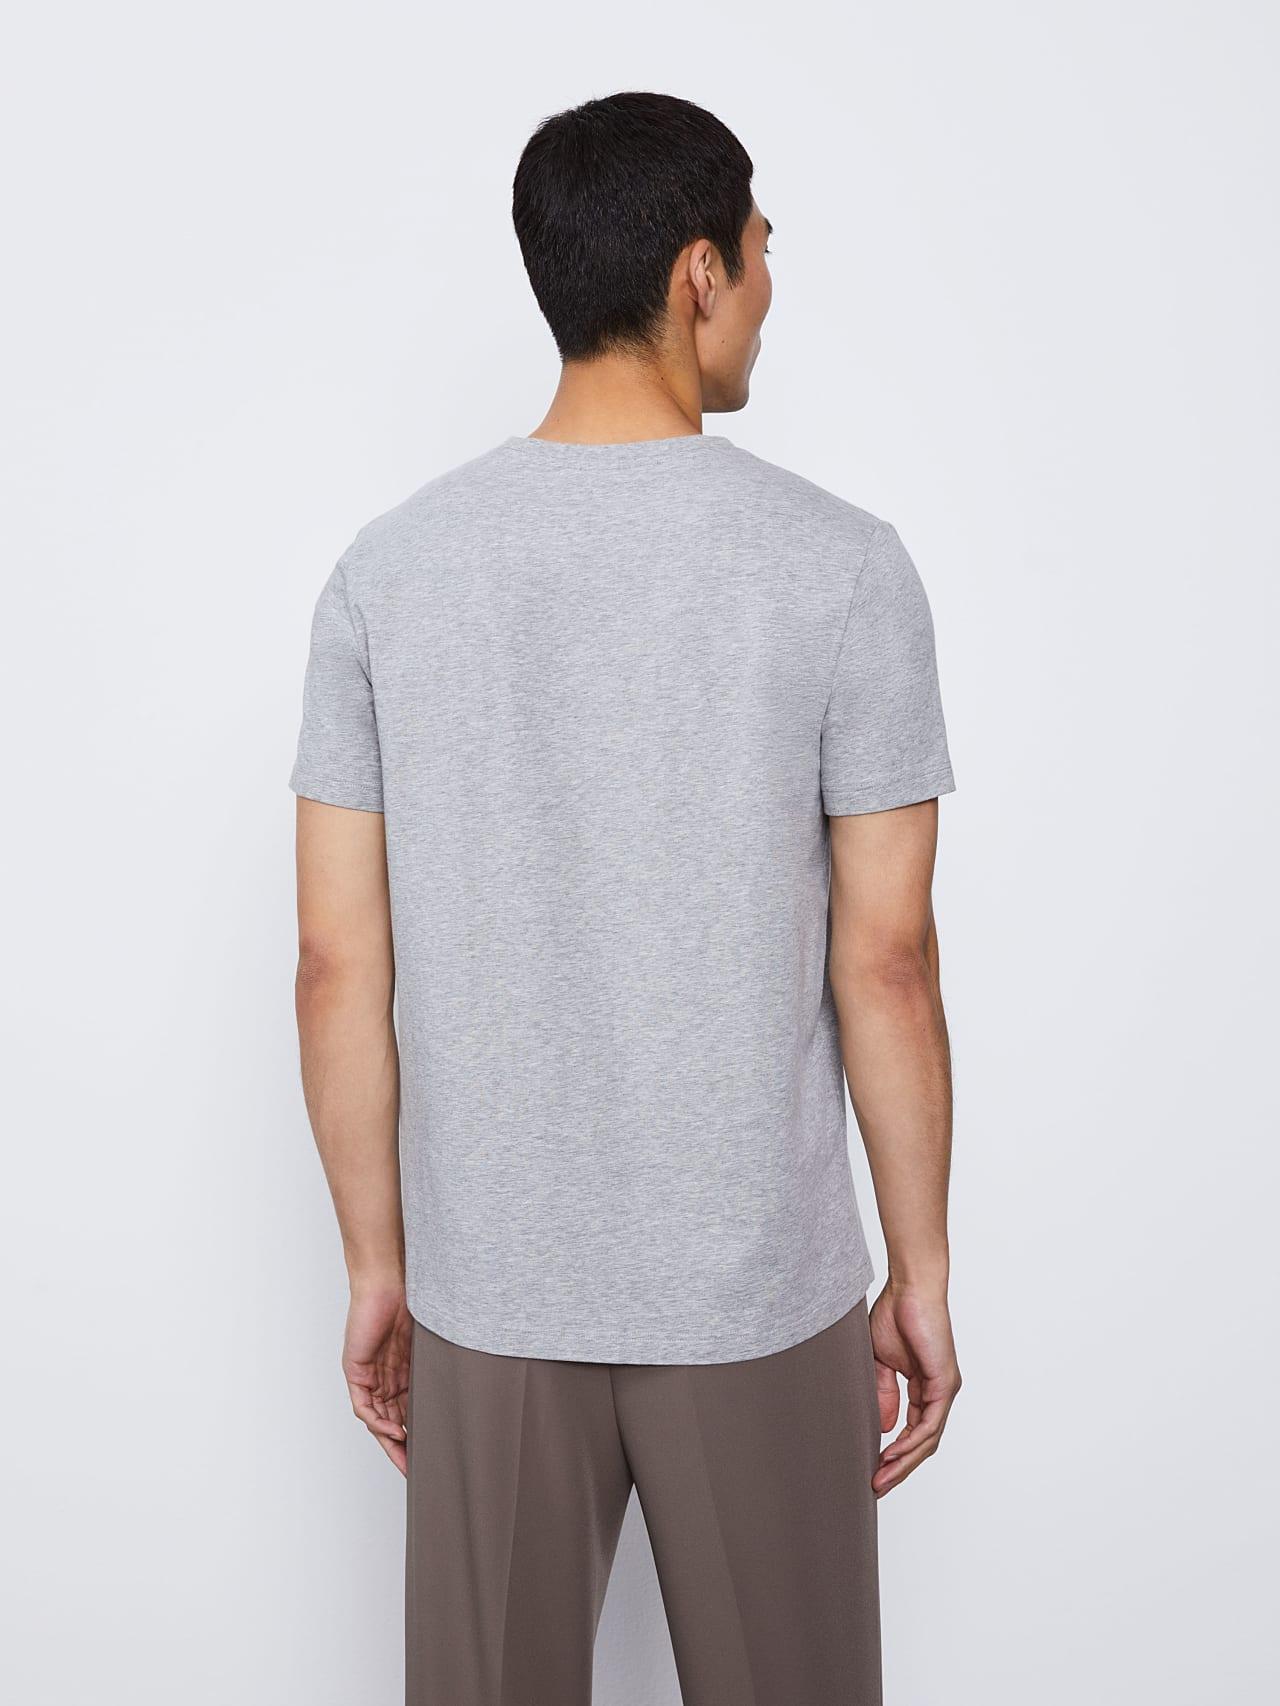 JERO V2.Y4.02 Signature Logo T-Shirt grey / melange Front Main Alpha Tauri